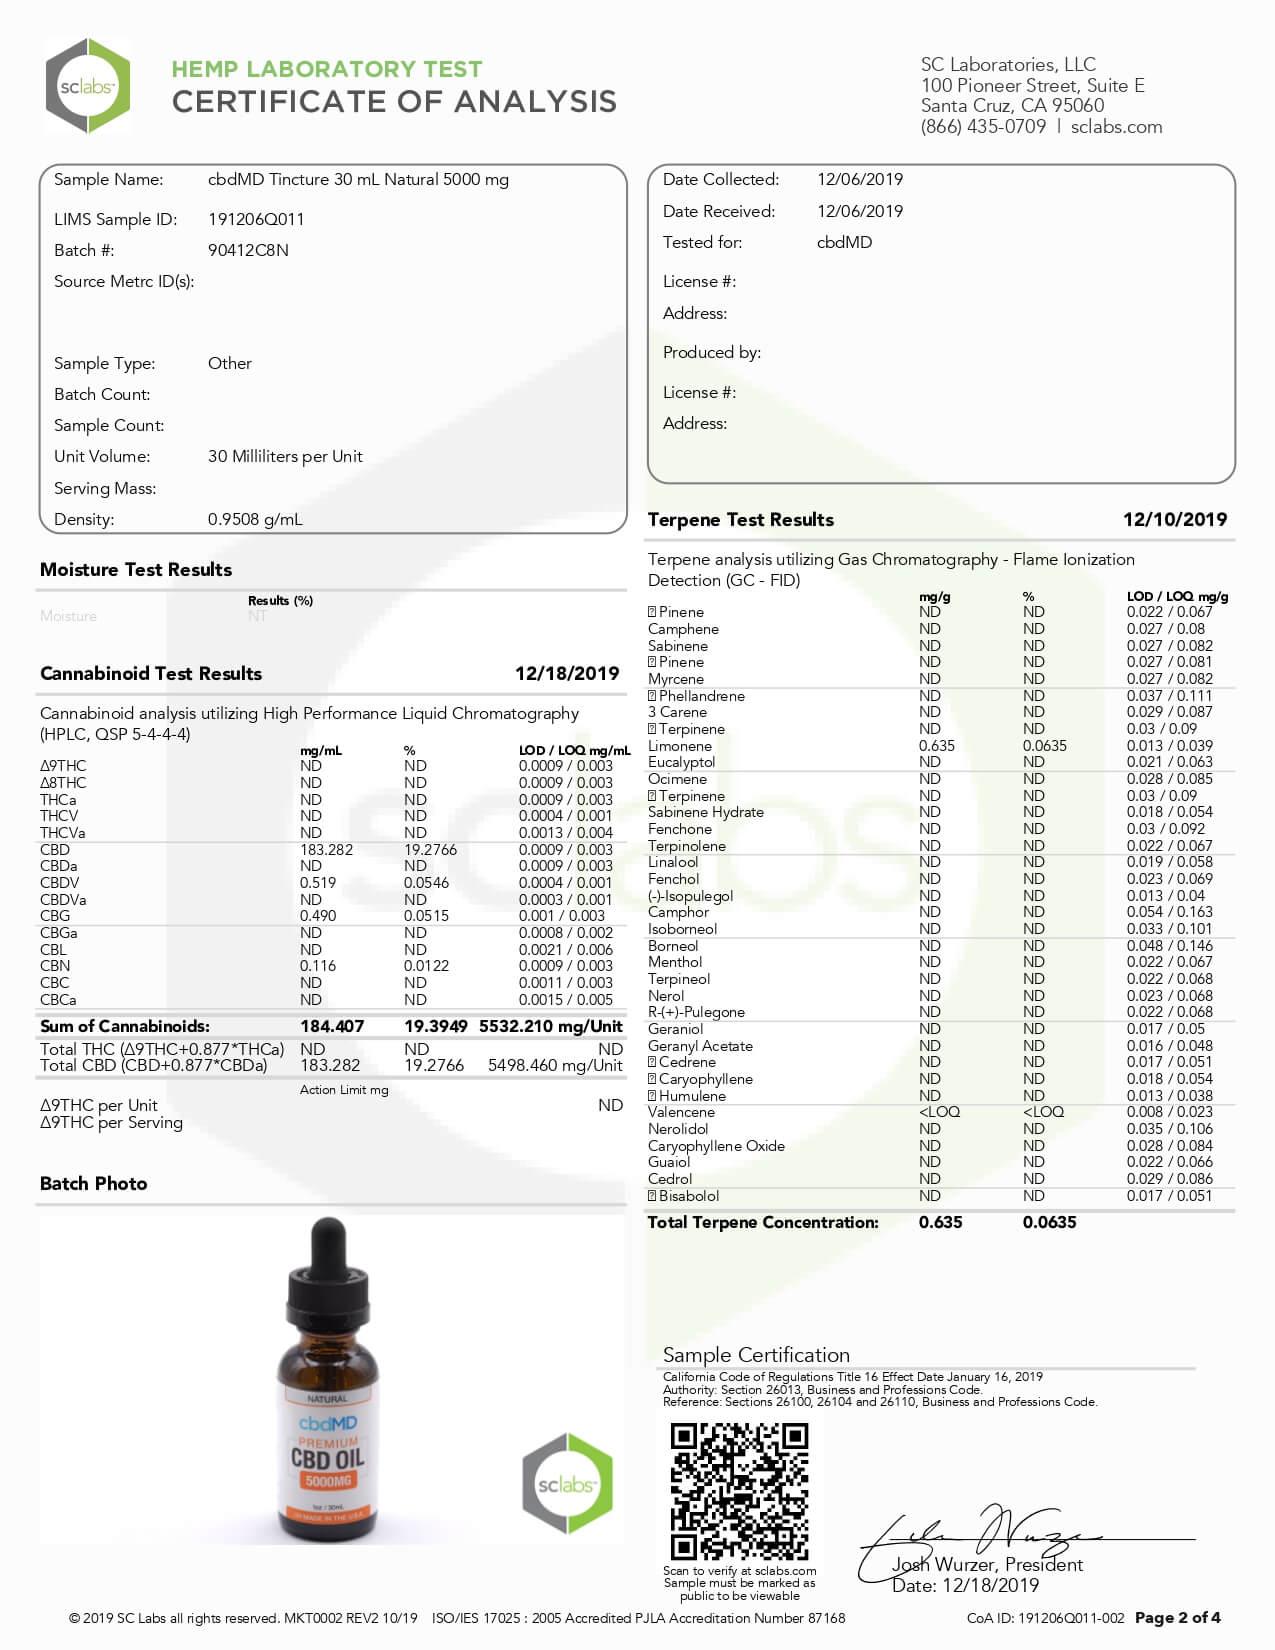 cbdMD CBD Tincture Broad Spectrum Orange 30ml 5000mg Lab Report